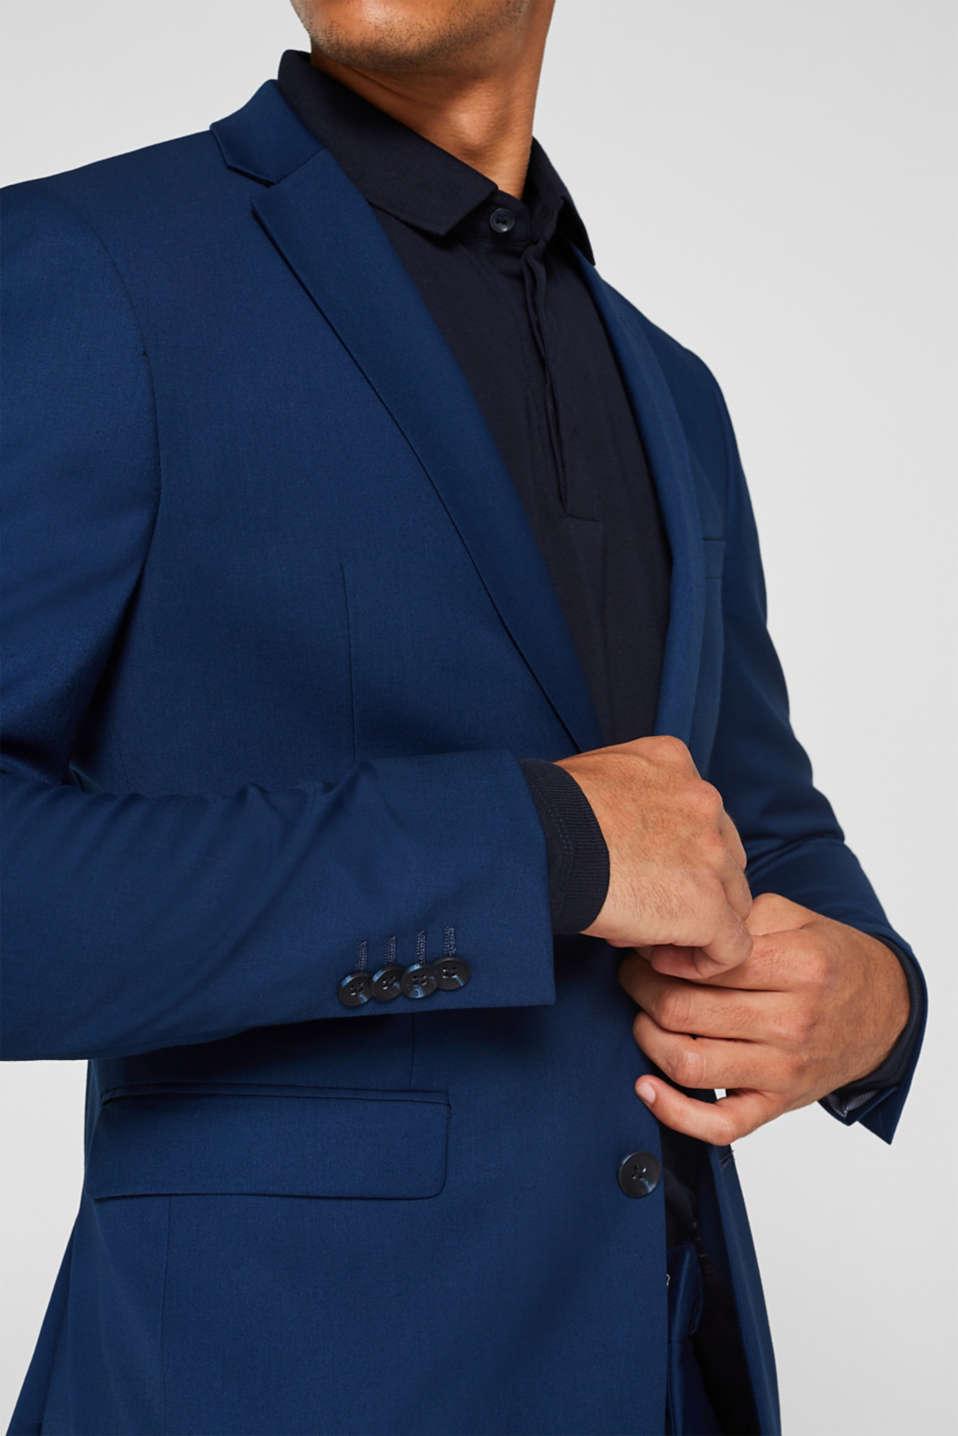 Blazers suit, BLUE, detail image number 2